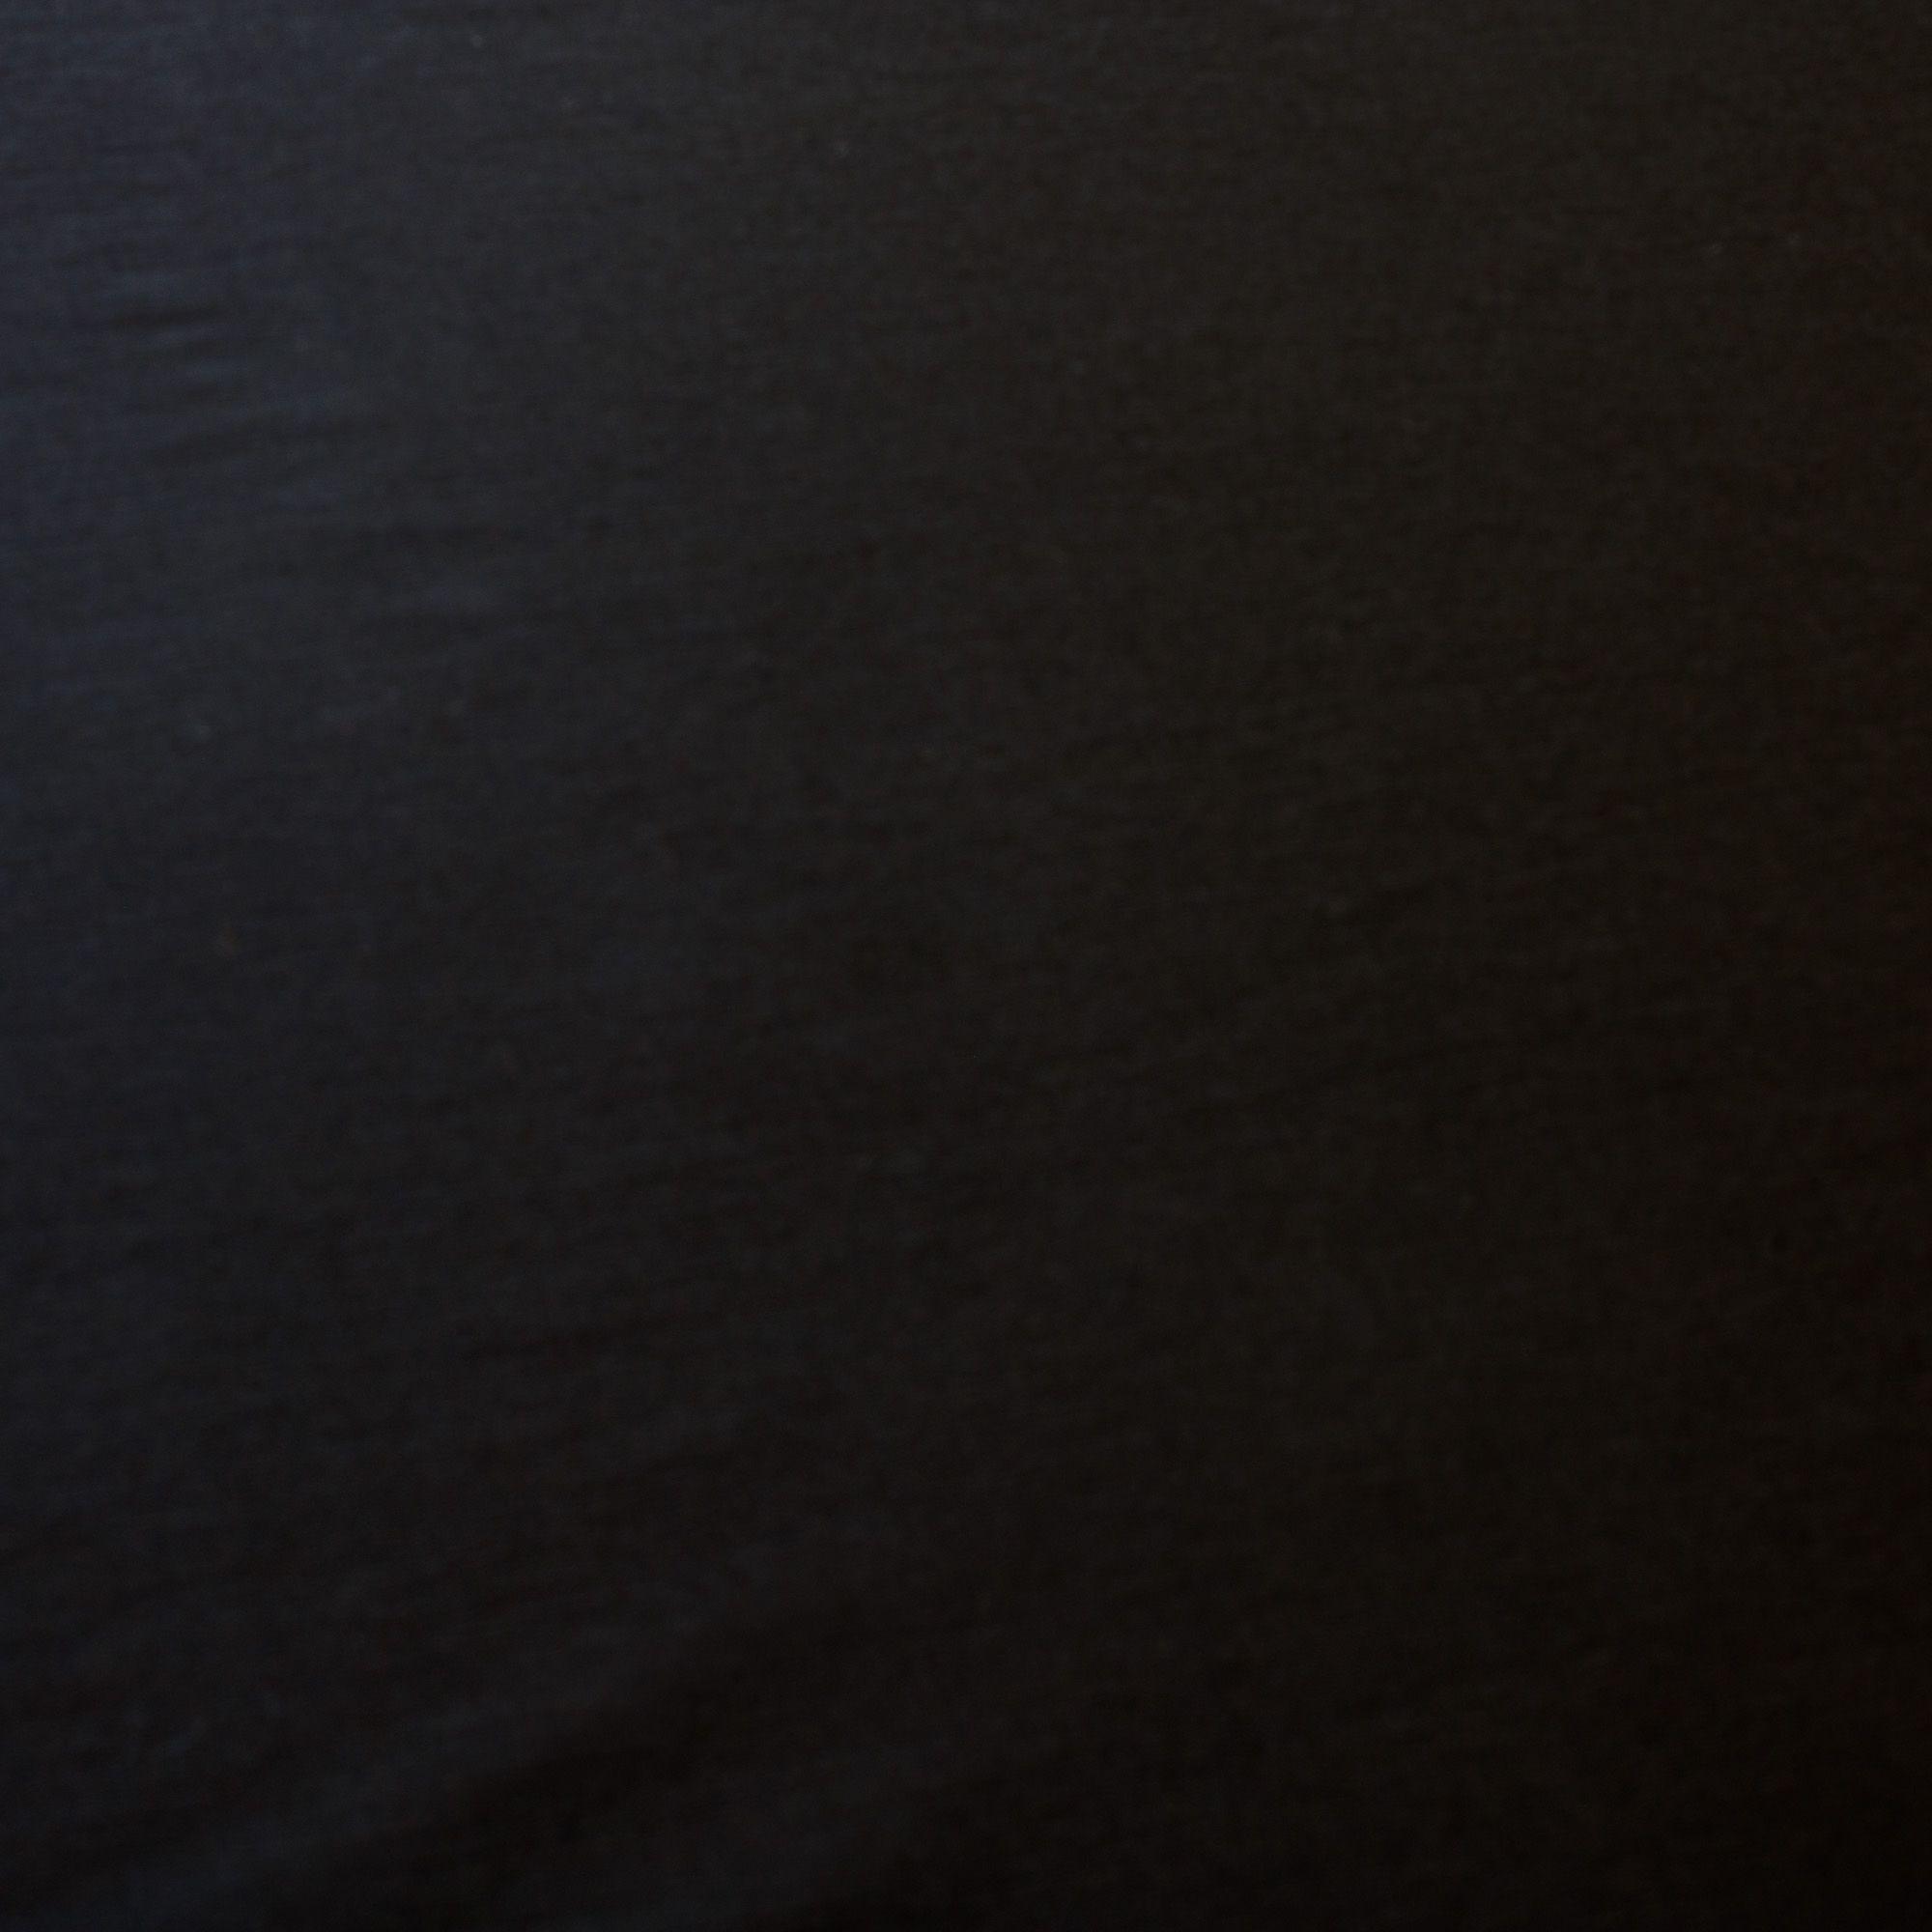 Tecido Bengaline Preto Liso 1,45 Mt Largura